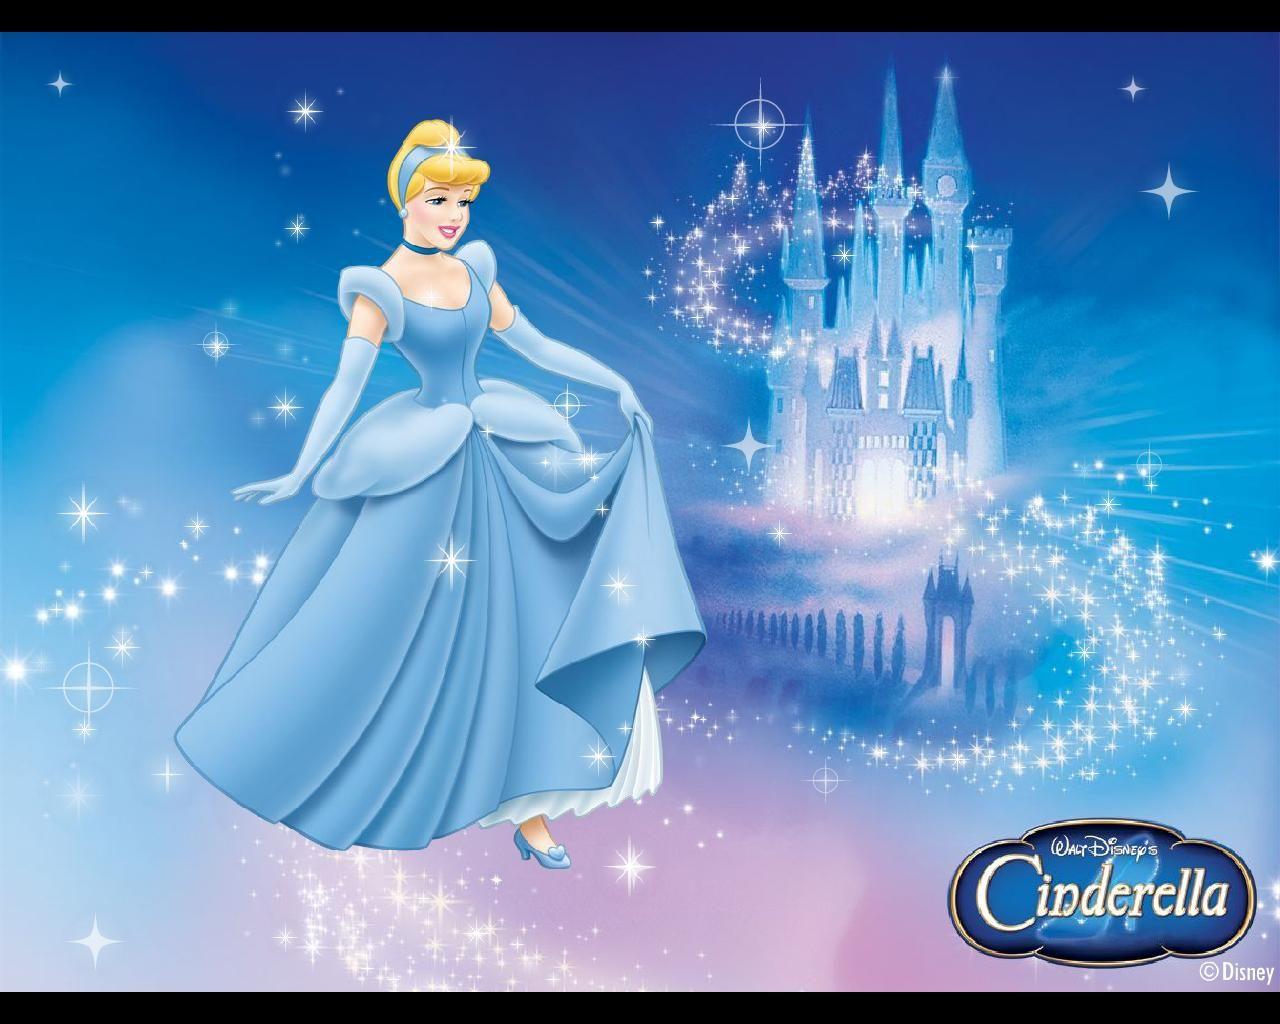 Disney Princess Images Icons Wallpapers And Photos On Fanpop Cinderella Disney Cinderella Cartoon Cinderella